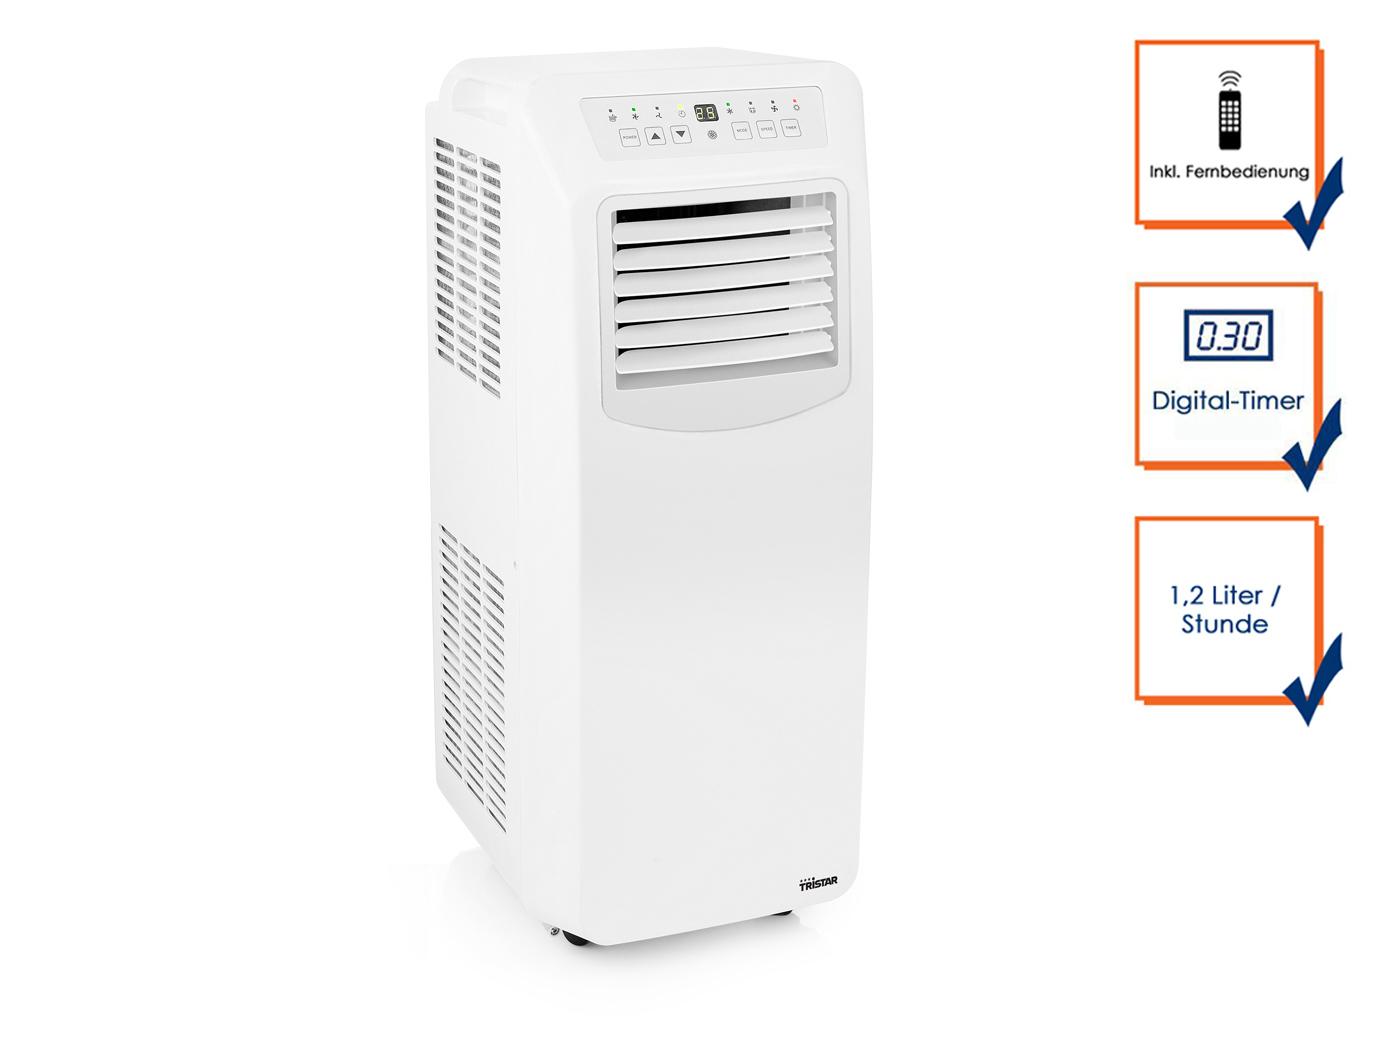 Lokales Klimagerät Timer Fernbedienung 2 93kw Mobile Klimaanlage